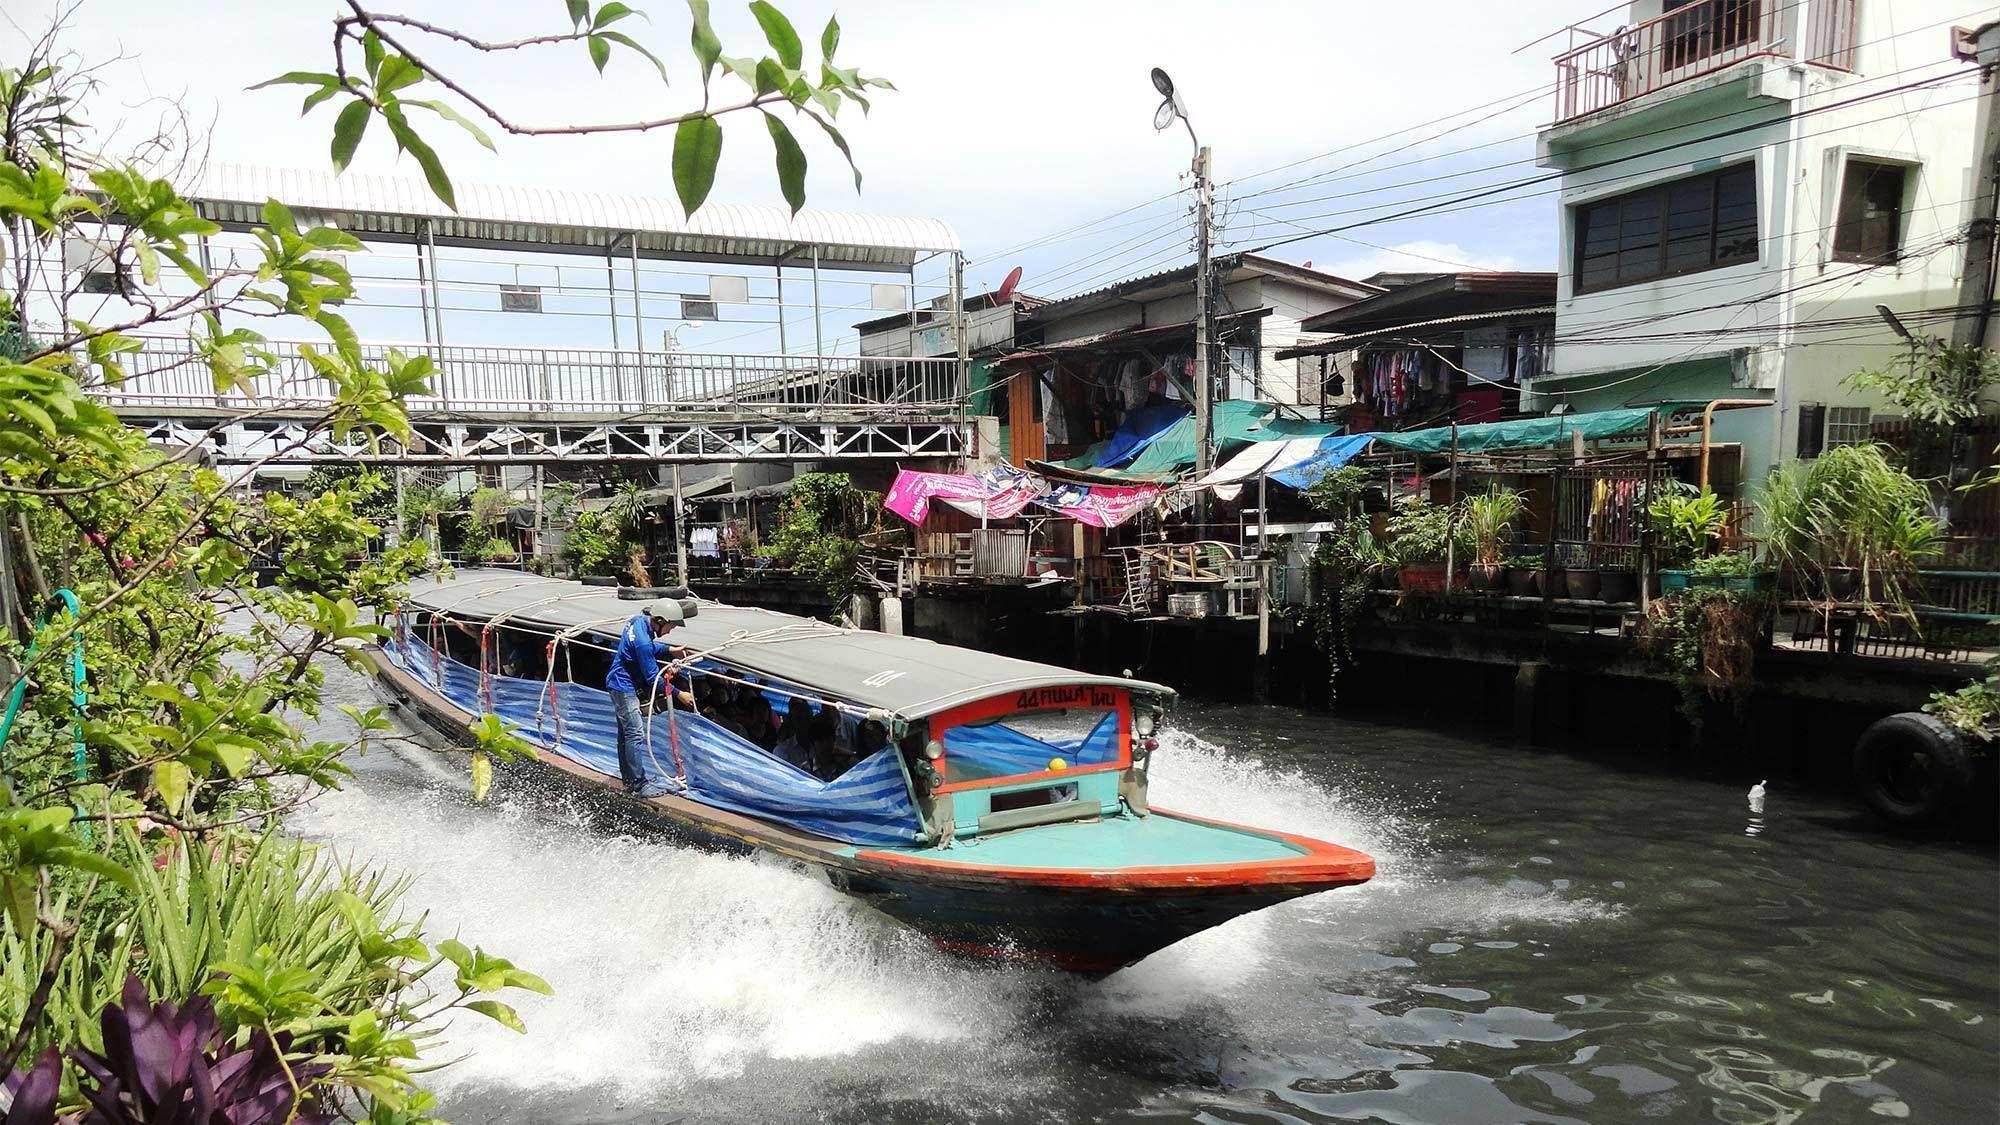 Vibrant view of the Thonburi Klongs tour in Thailand